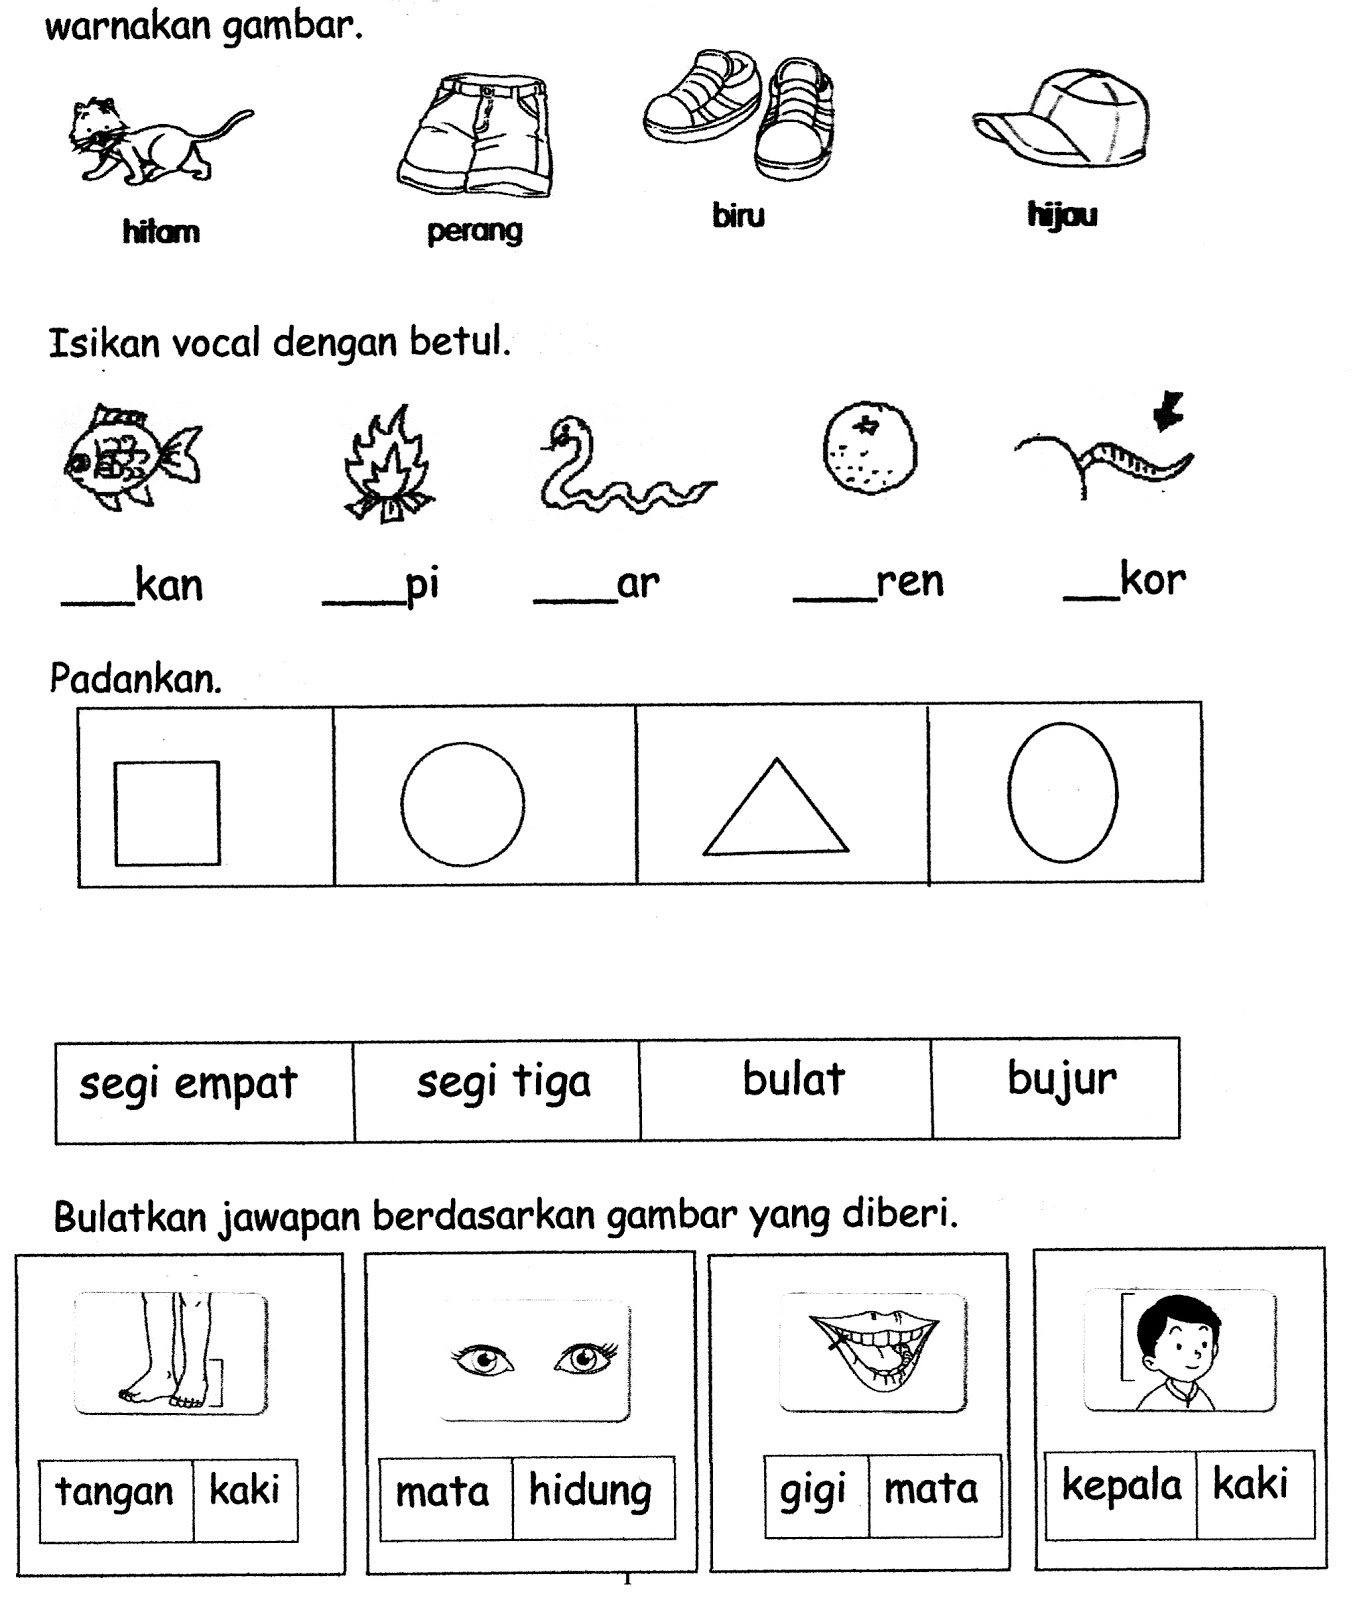 Worksheet Suku Kata Printable Worksheets And Activities For Teachers Parents Tutors And Homeschool Families